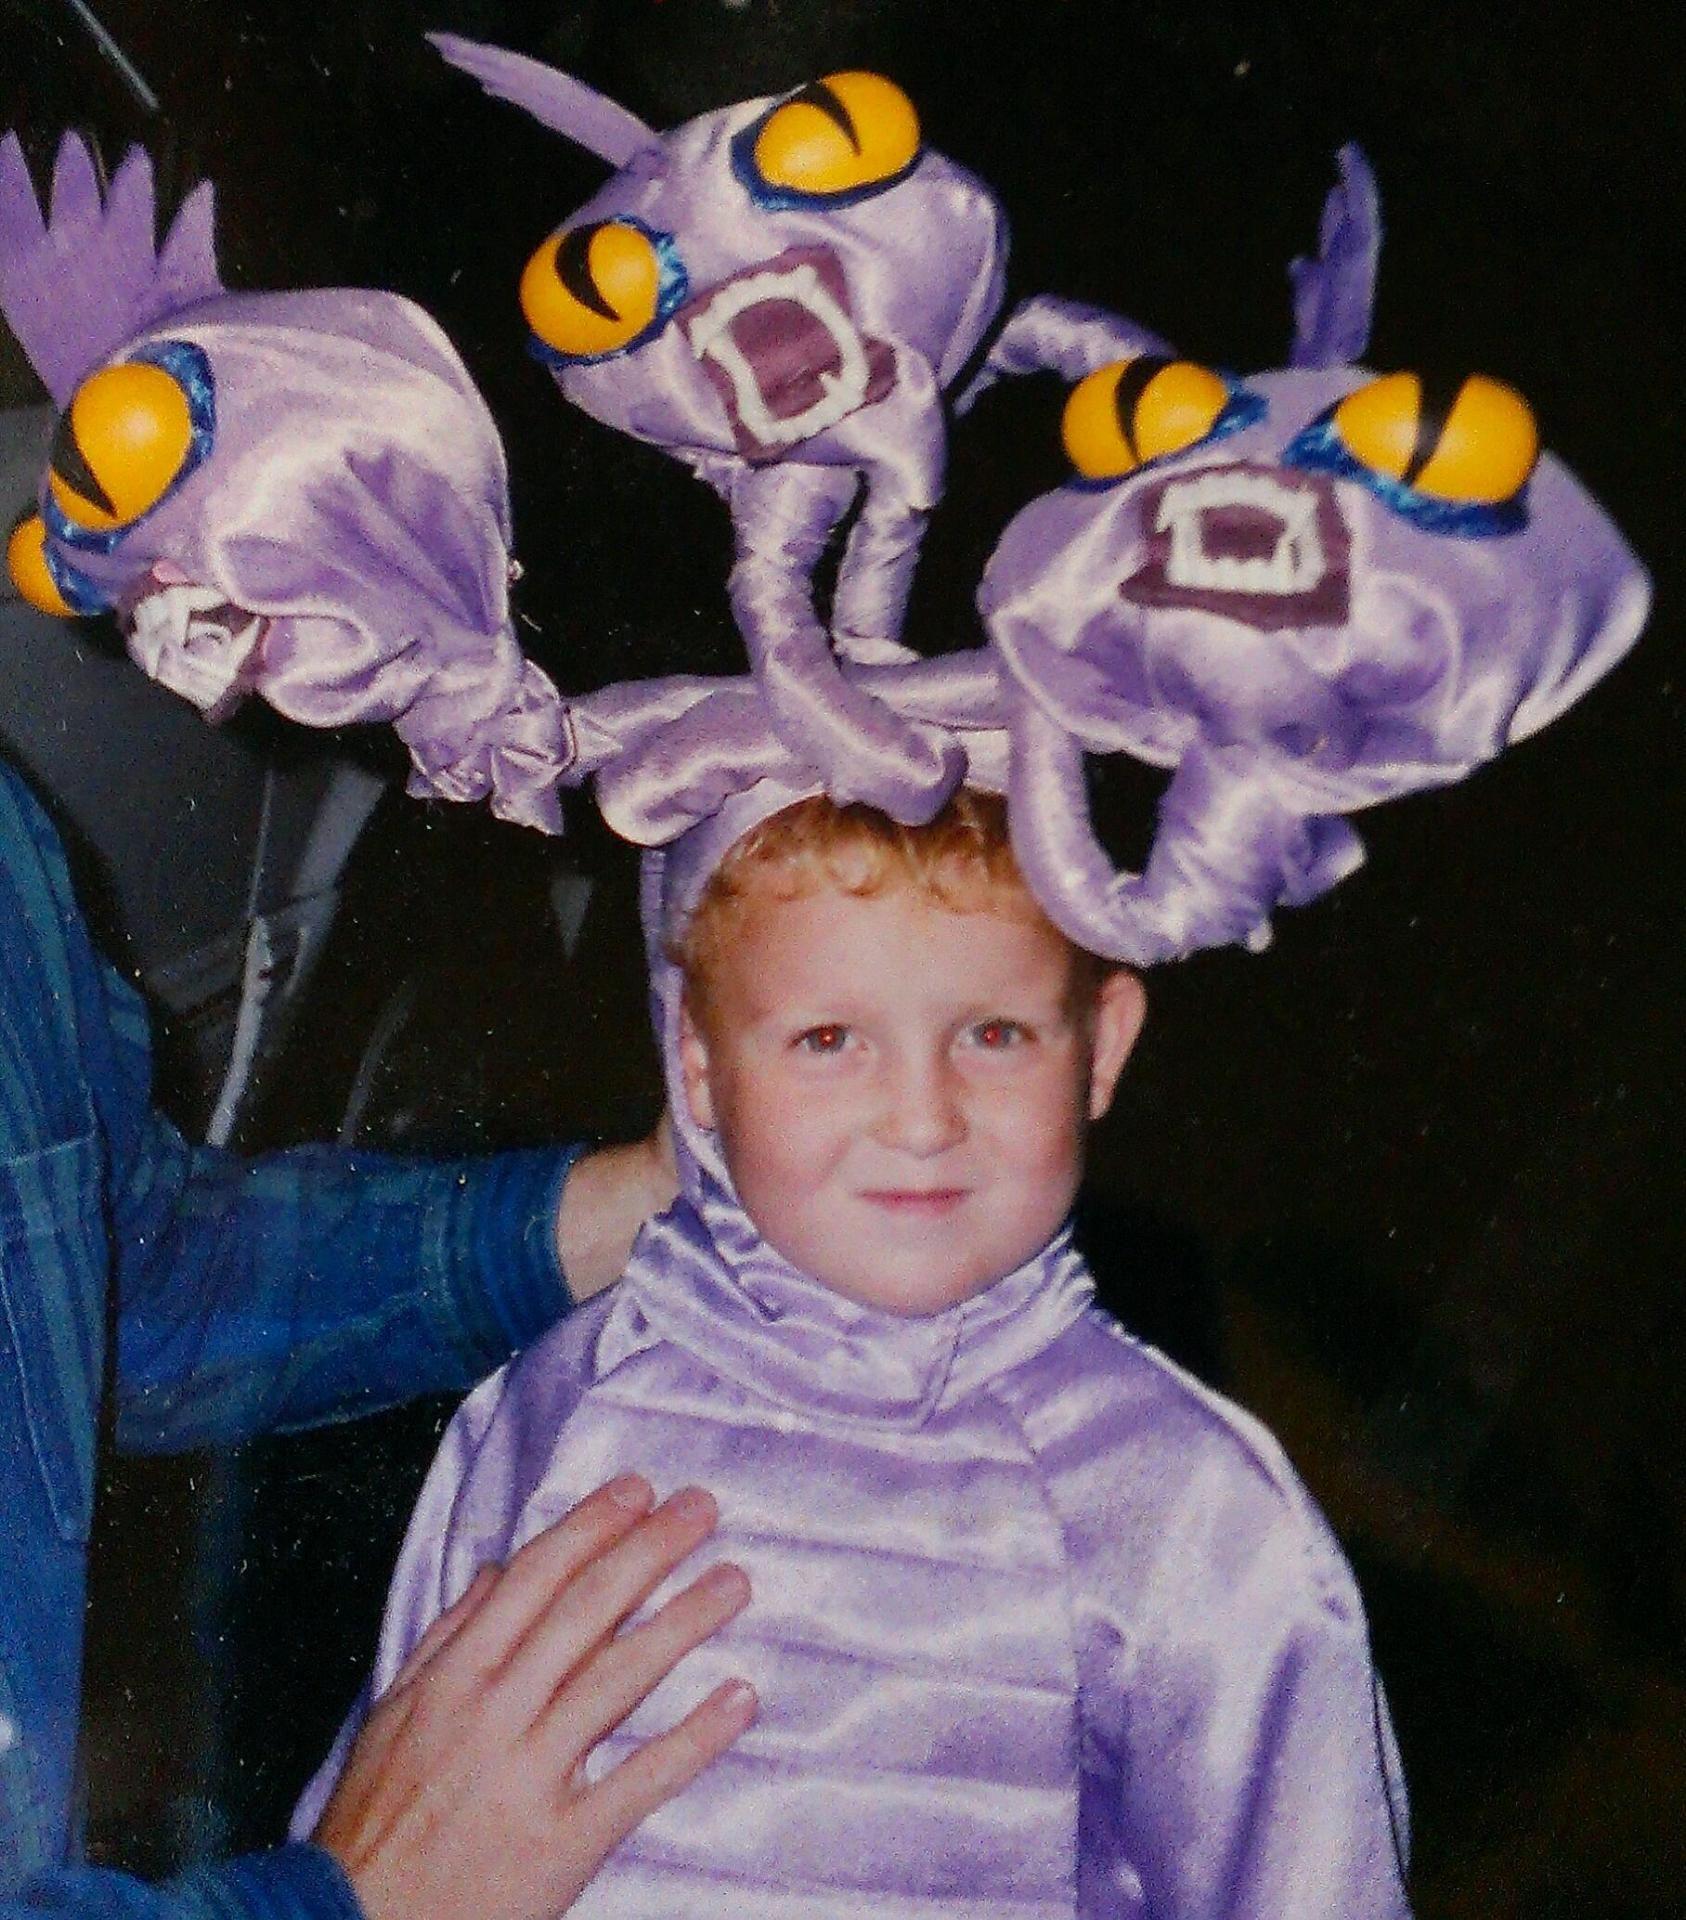 Hercules hydra costume my dad made me in 1998. Wish it